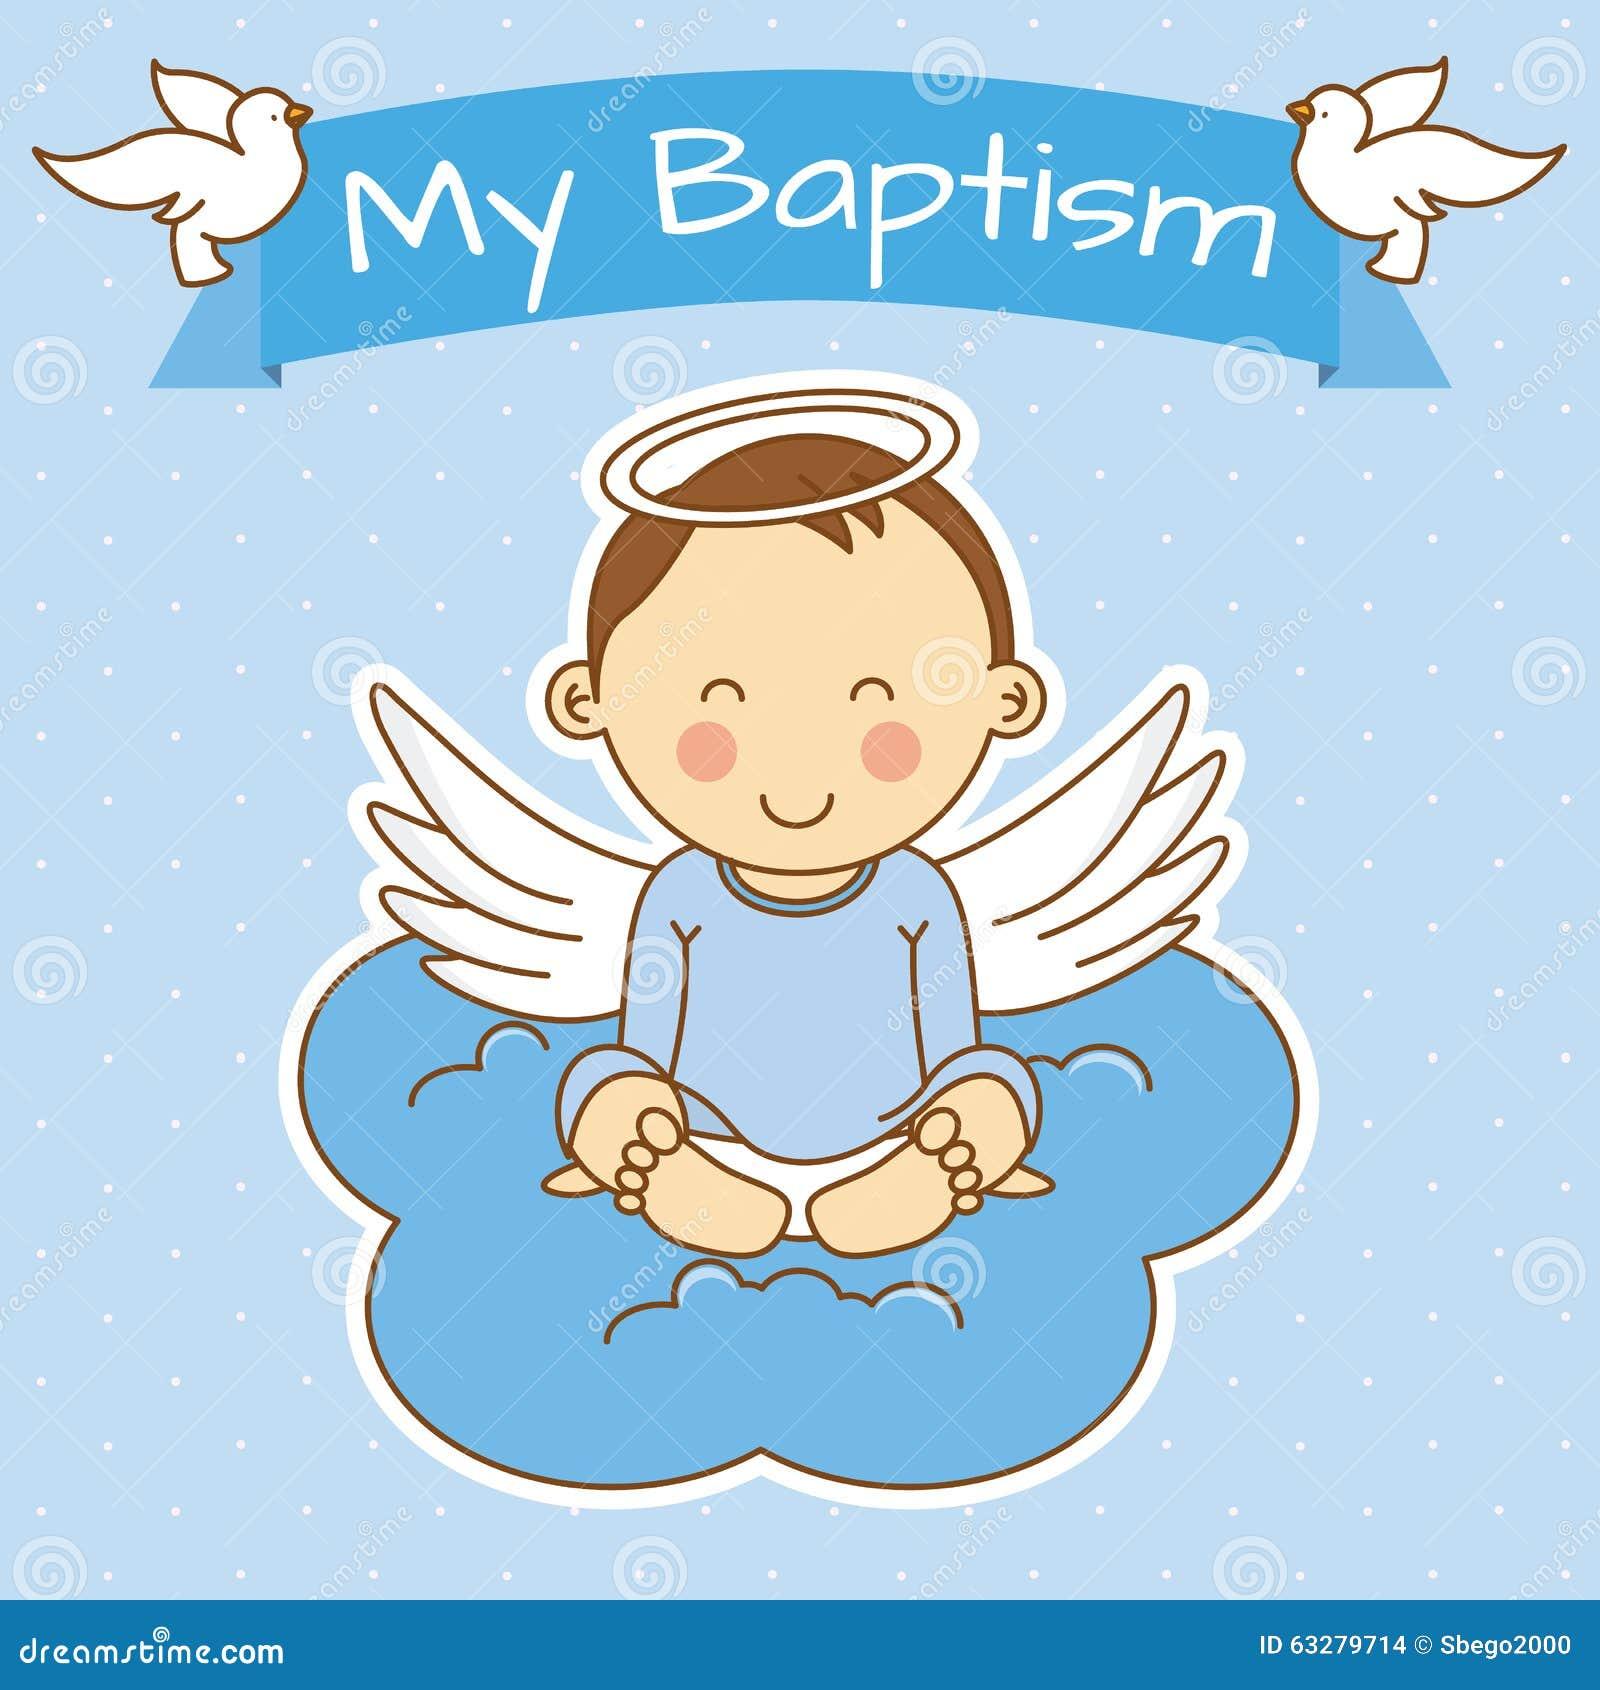 Girl Baptism Stock Vector - Image: 63279714